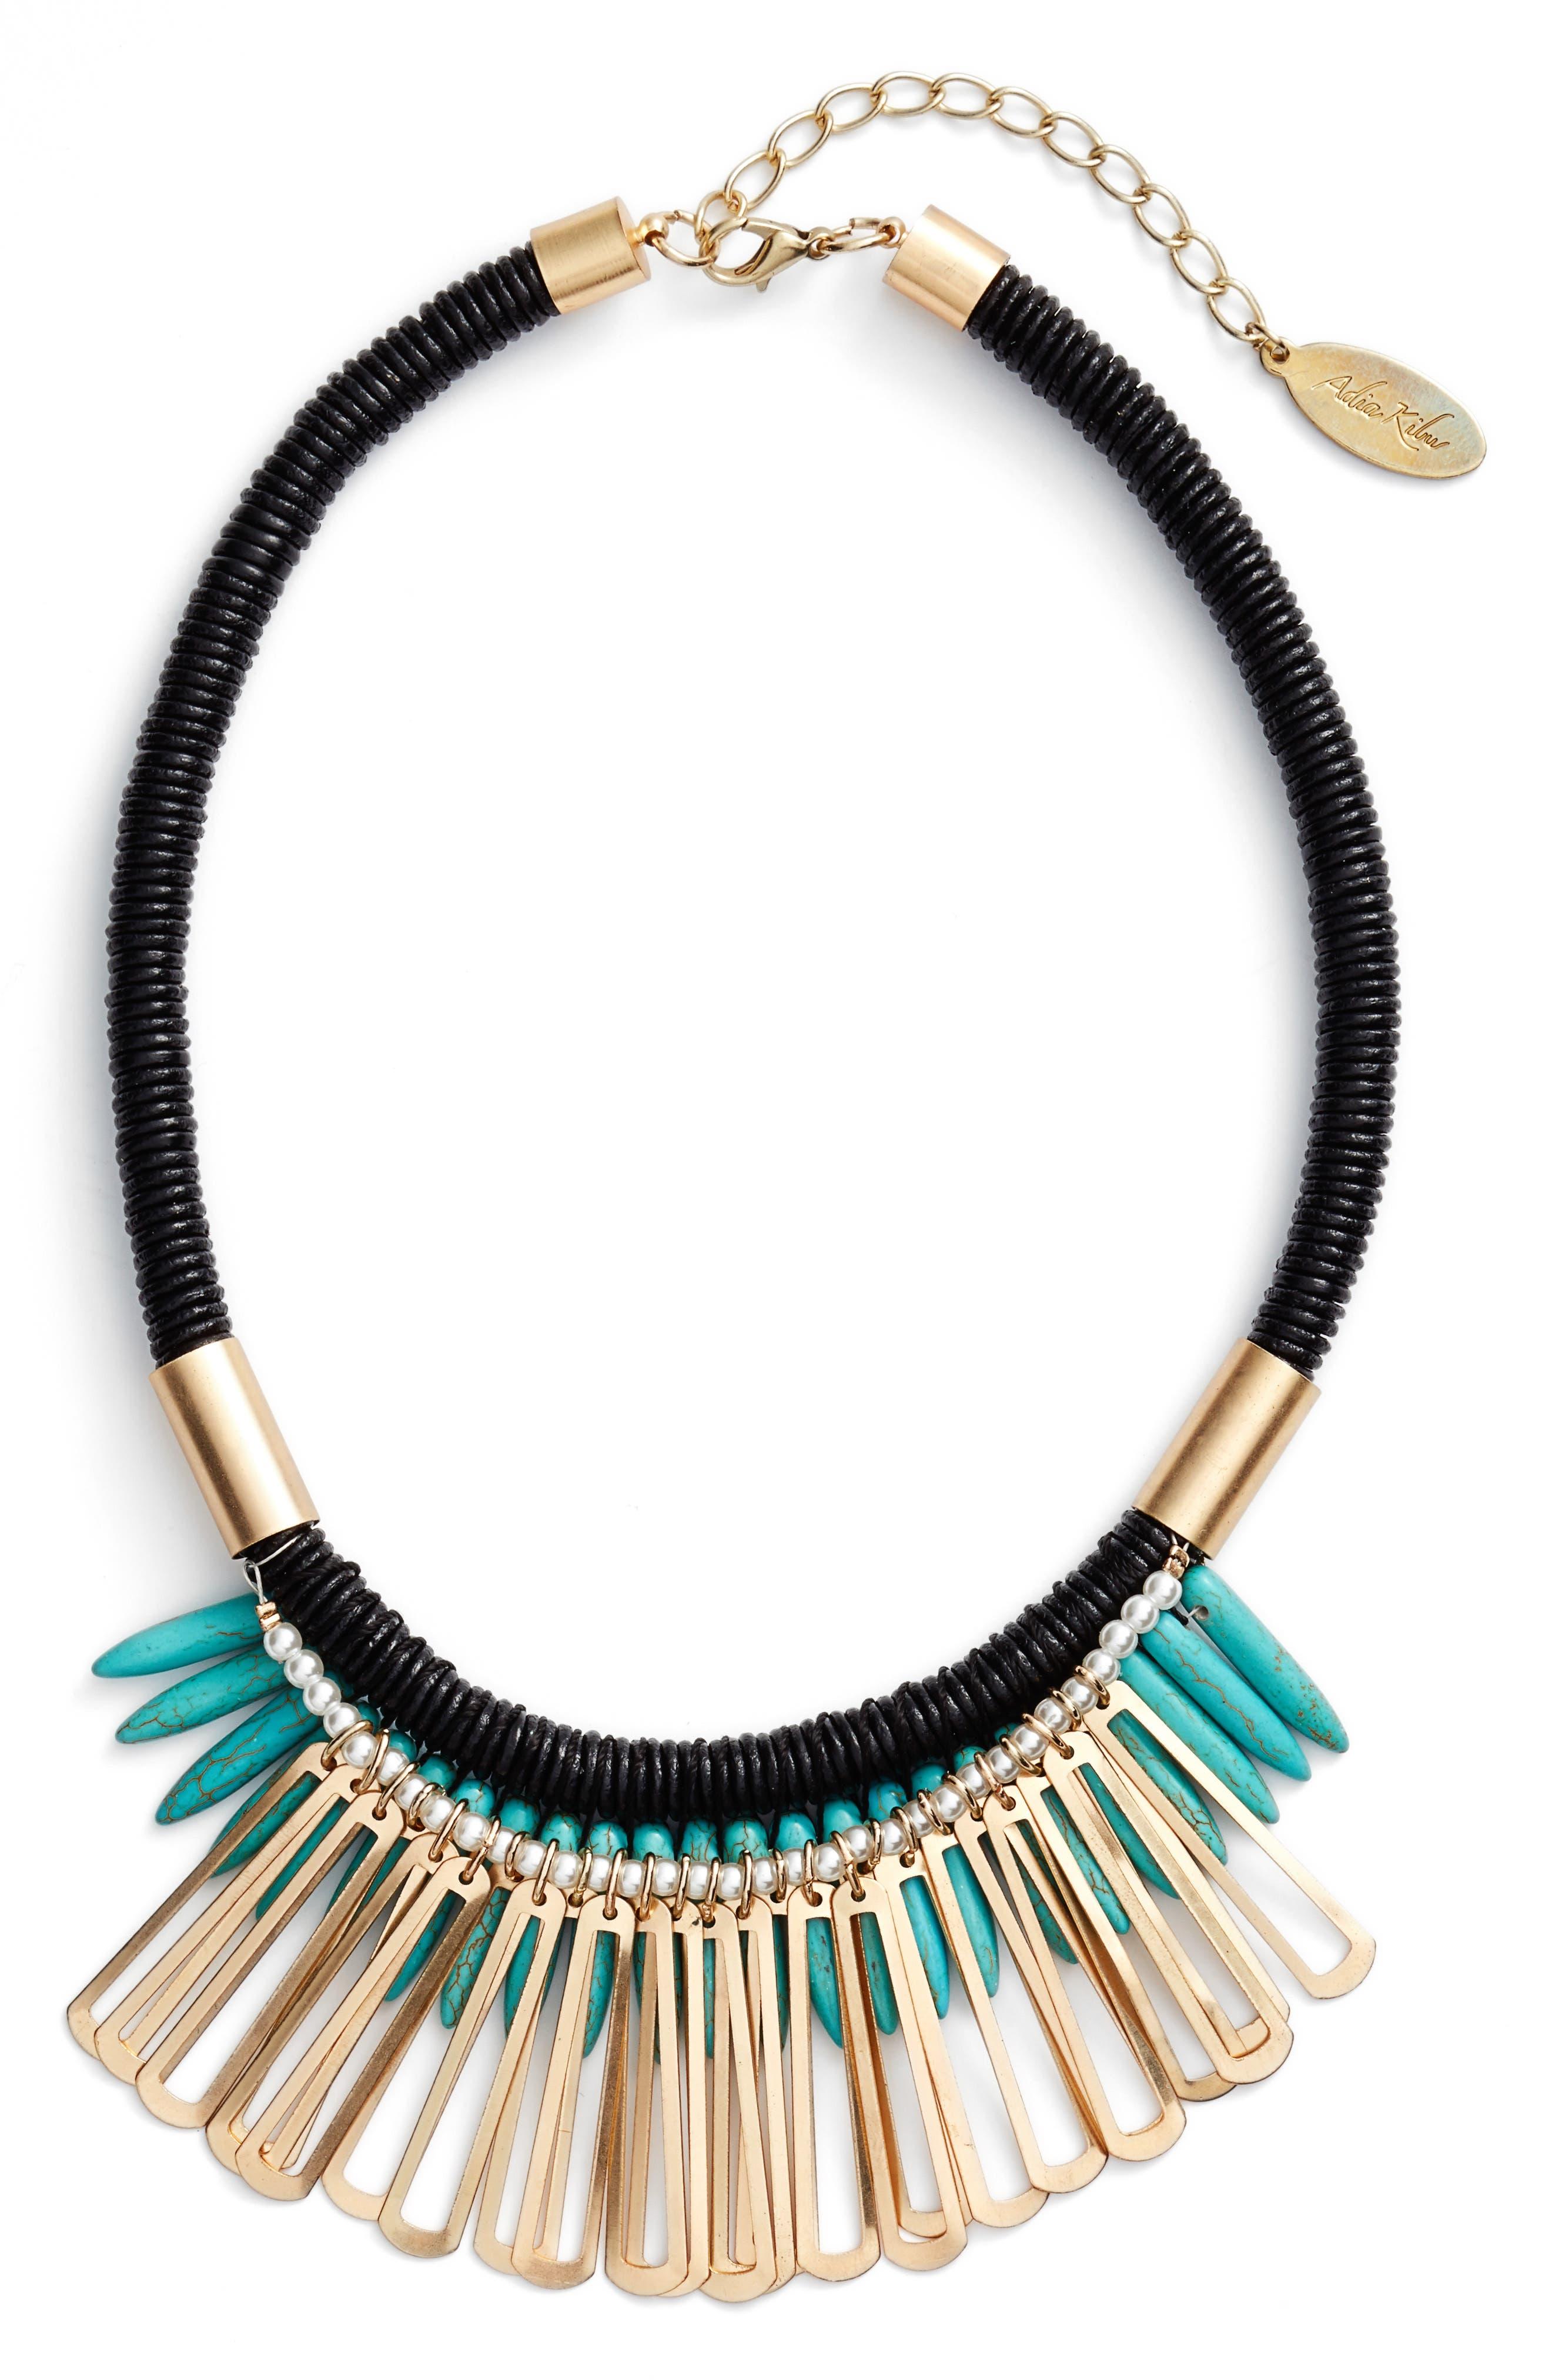 ADIA KIBUR Spike Stone Statement Bib Necklace, Turquoise